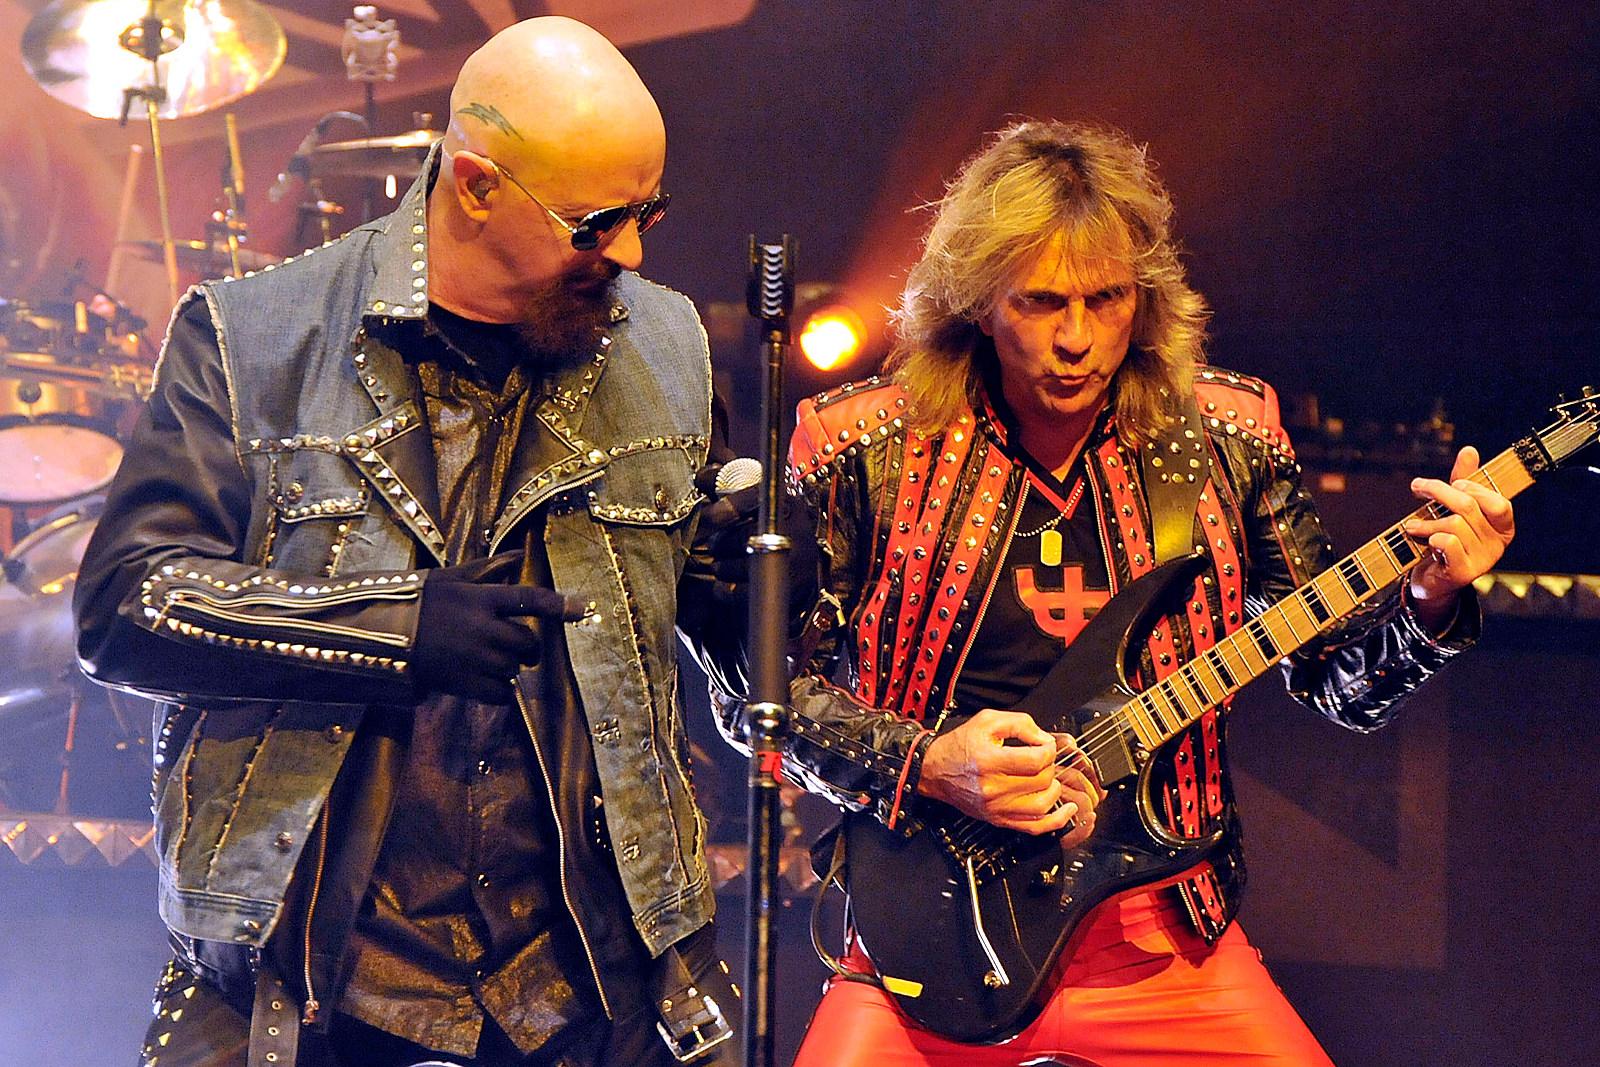 Glenn Tipton Is 'Still Actively Involved With Judas Priest'